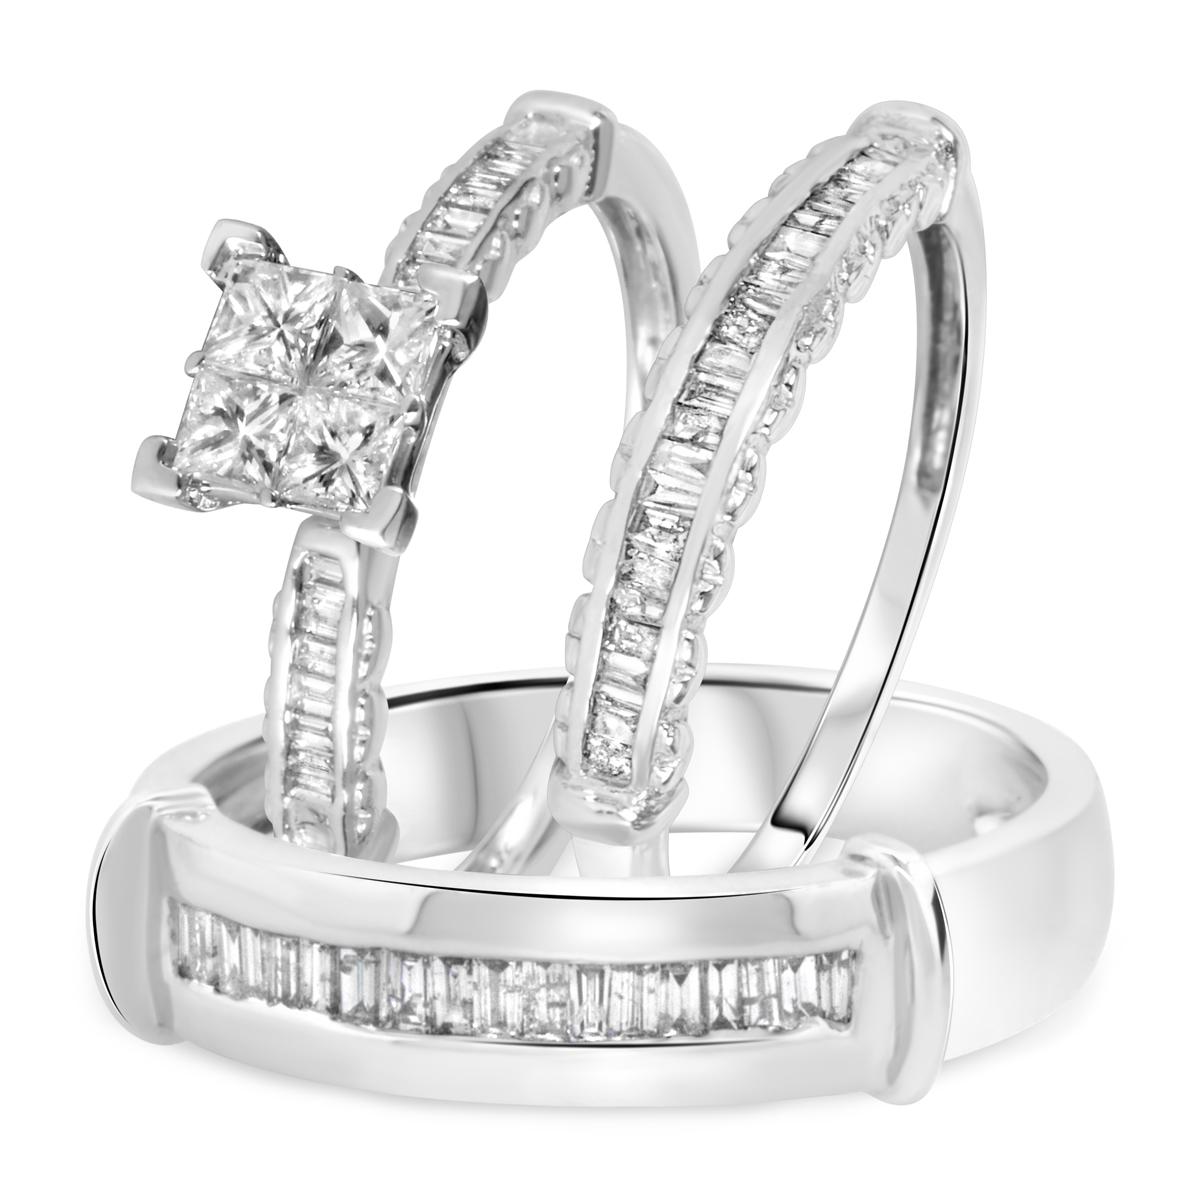 1 1/5 CT. T.W. Diamond Ladies Engagement Ring, Wedding Band, Men's Wedding Band